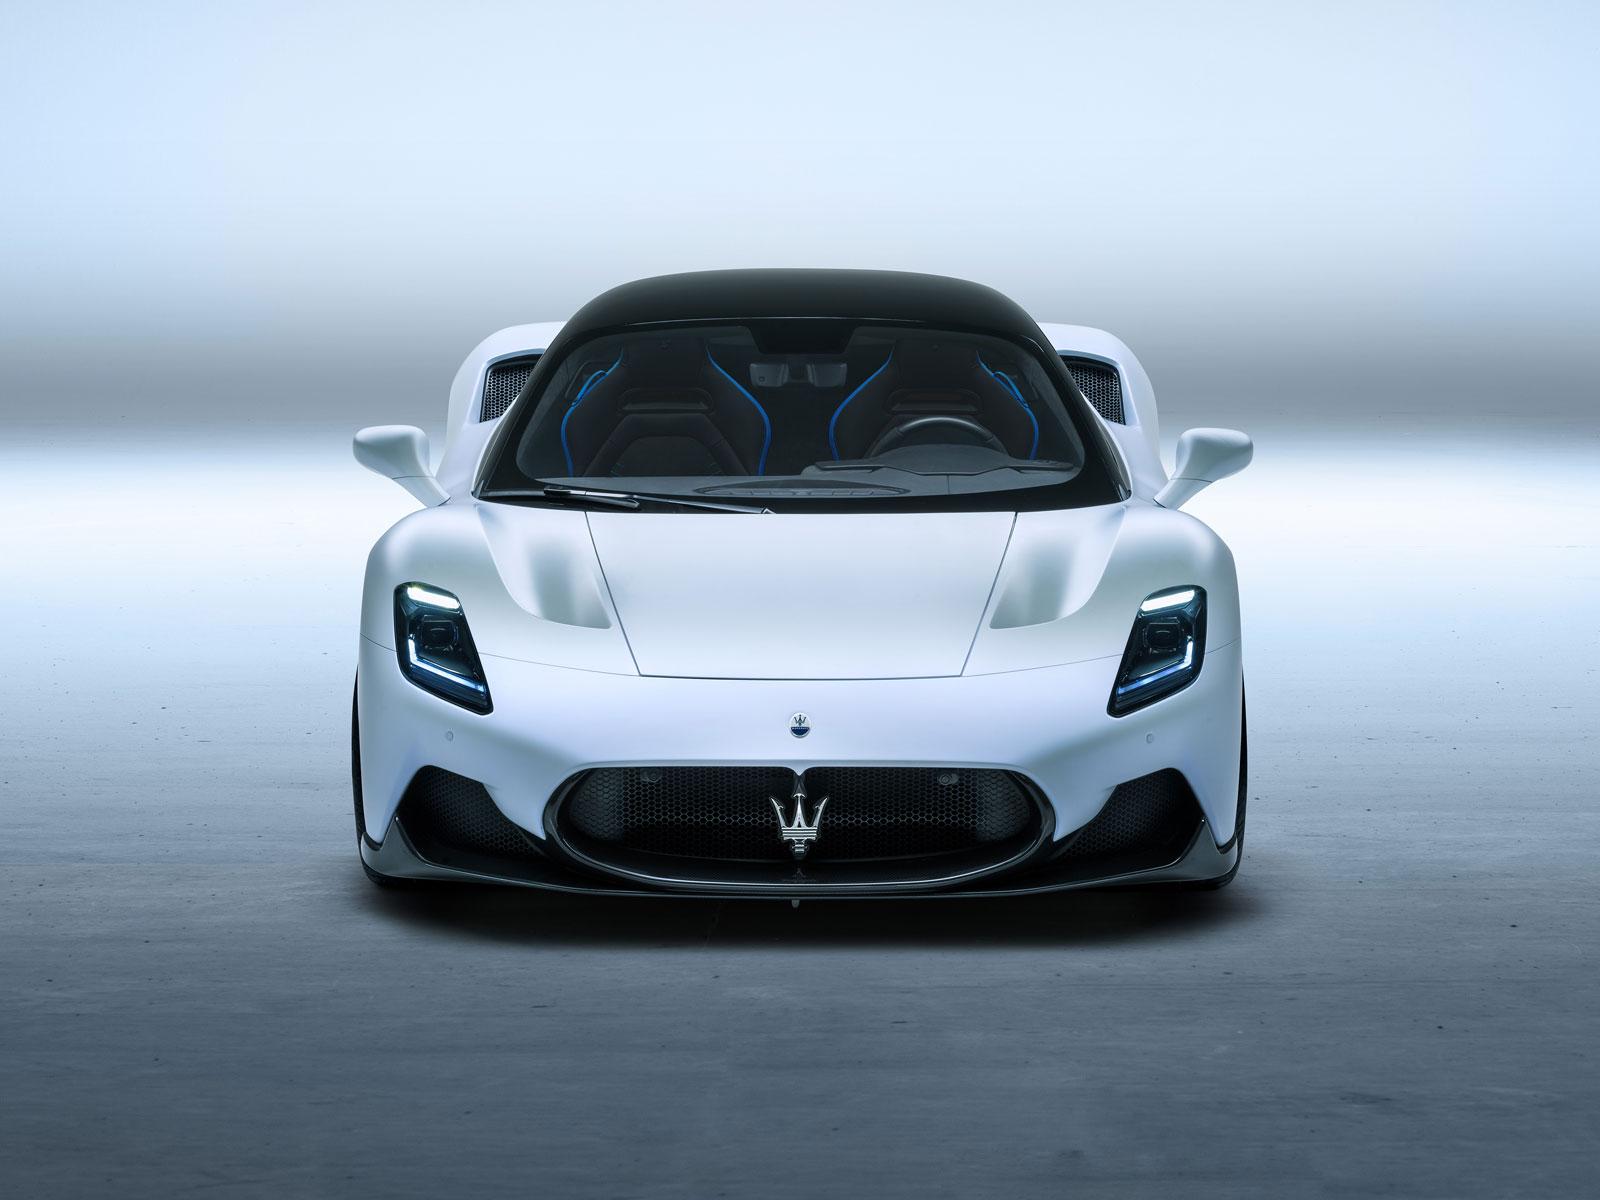 Maserati Trident front view